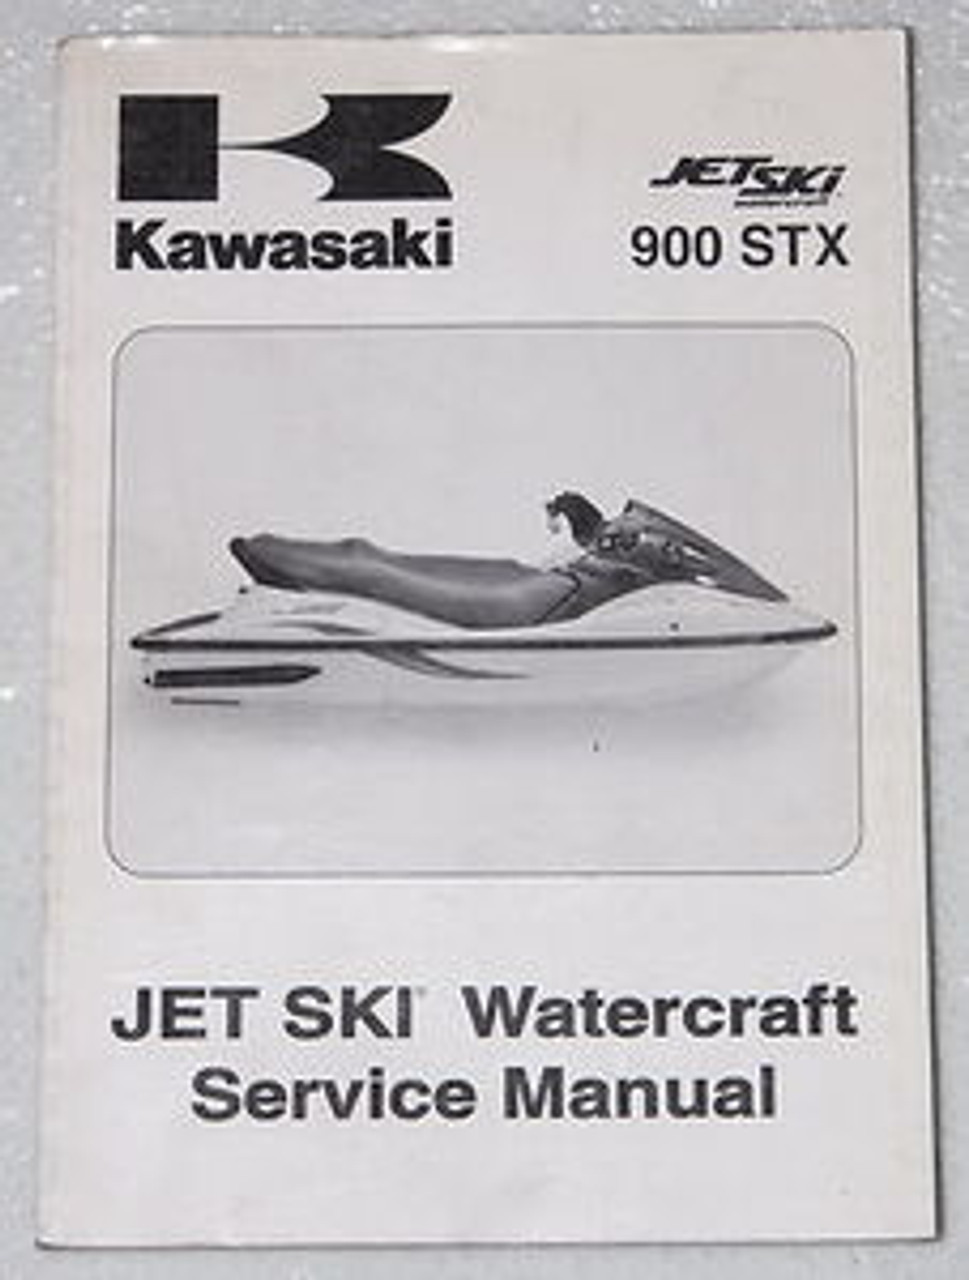 2004 Kawasaki 900 Stx Jet Ski Factory Service Manual Jt900